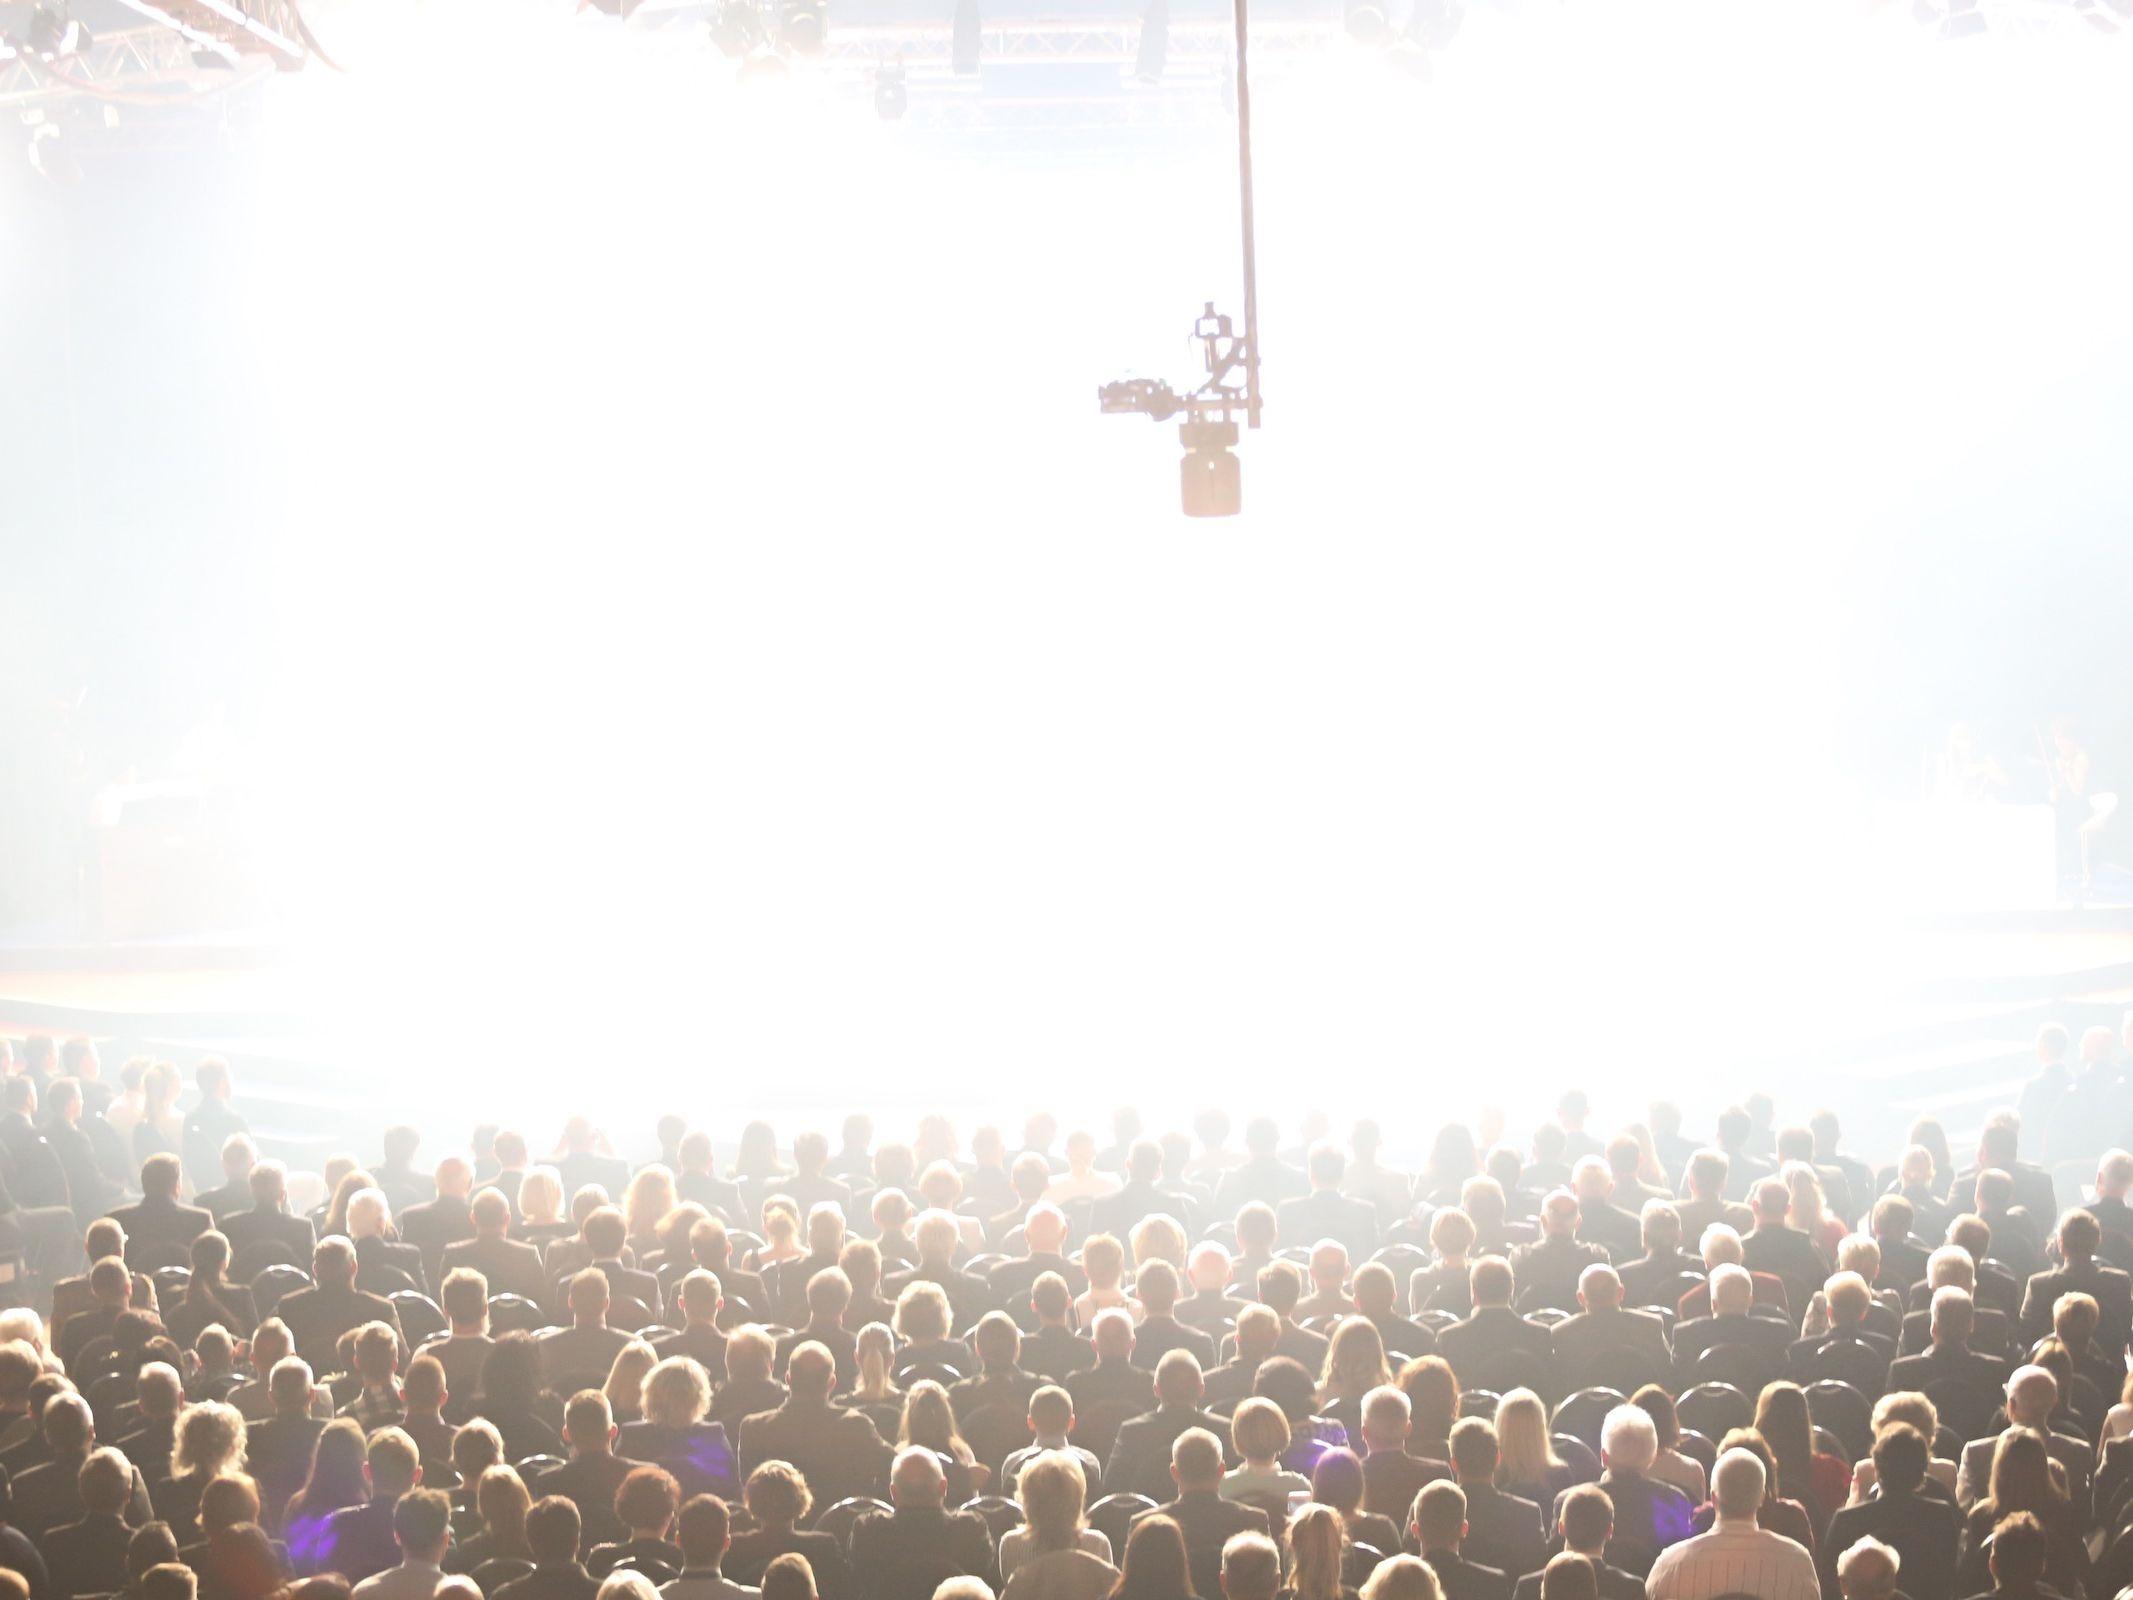 Band | Hannover | Liveband | Livemusik | Walking | Act | Partyband | Jazzband | Swingband | Loungeband | Popband | Jazz | Saxophonist | Bühnenshow | Konzert | Hochzeit | Messe | Firmenfeier | Charity | Gala | Buchen | Anfragen